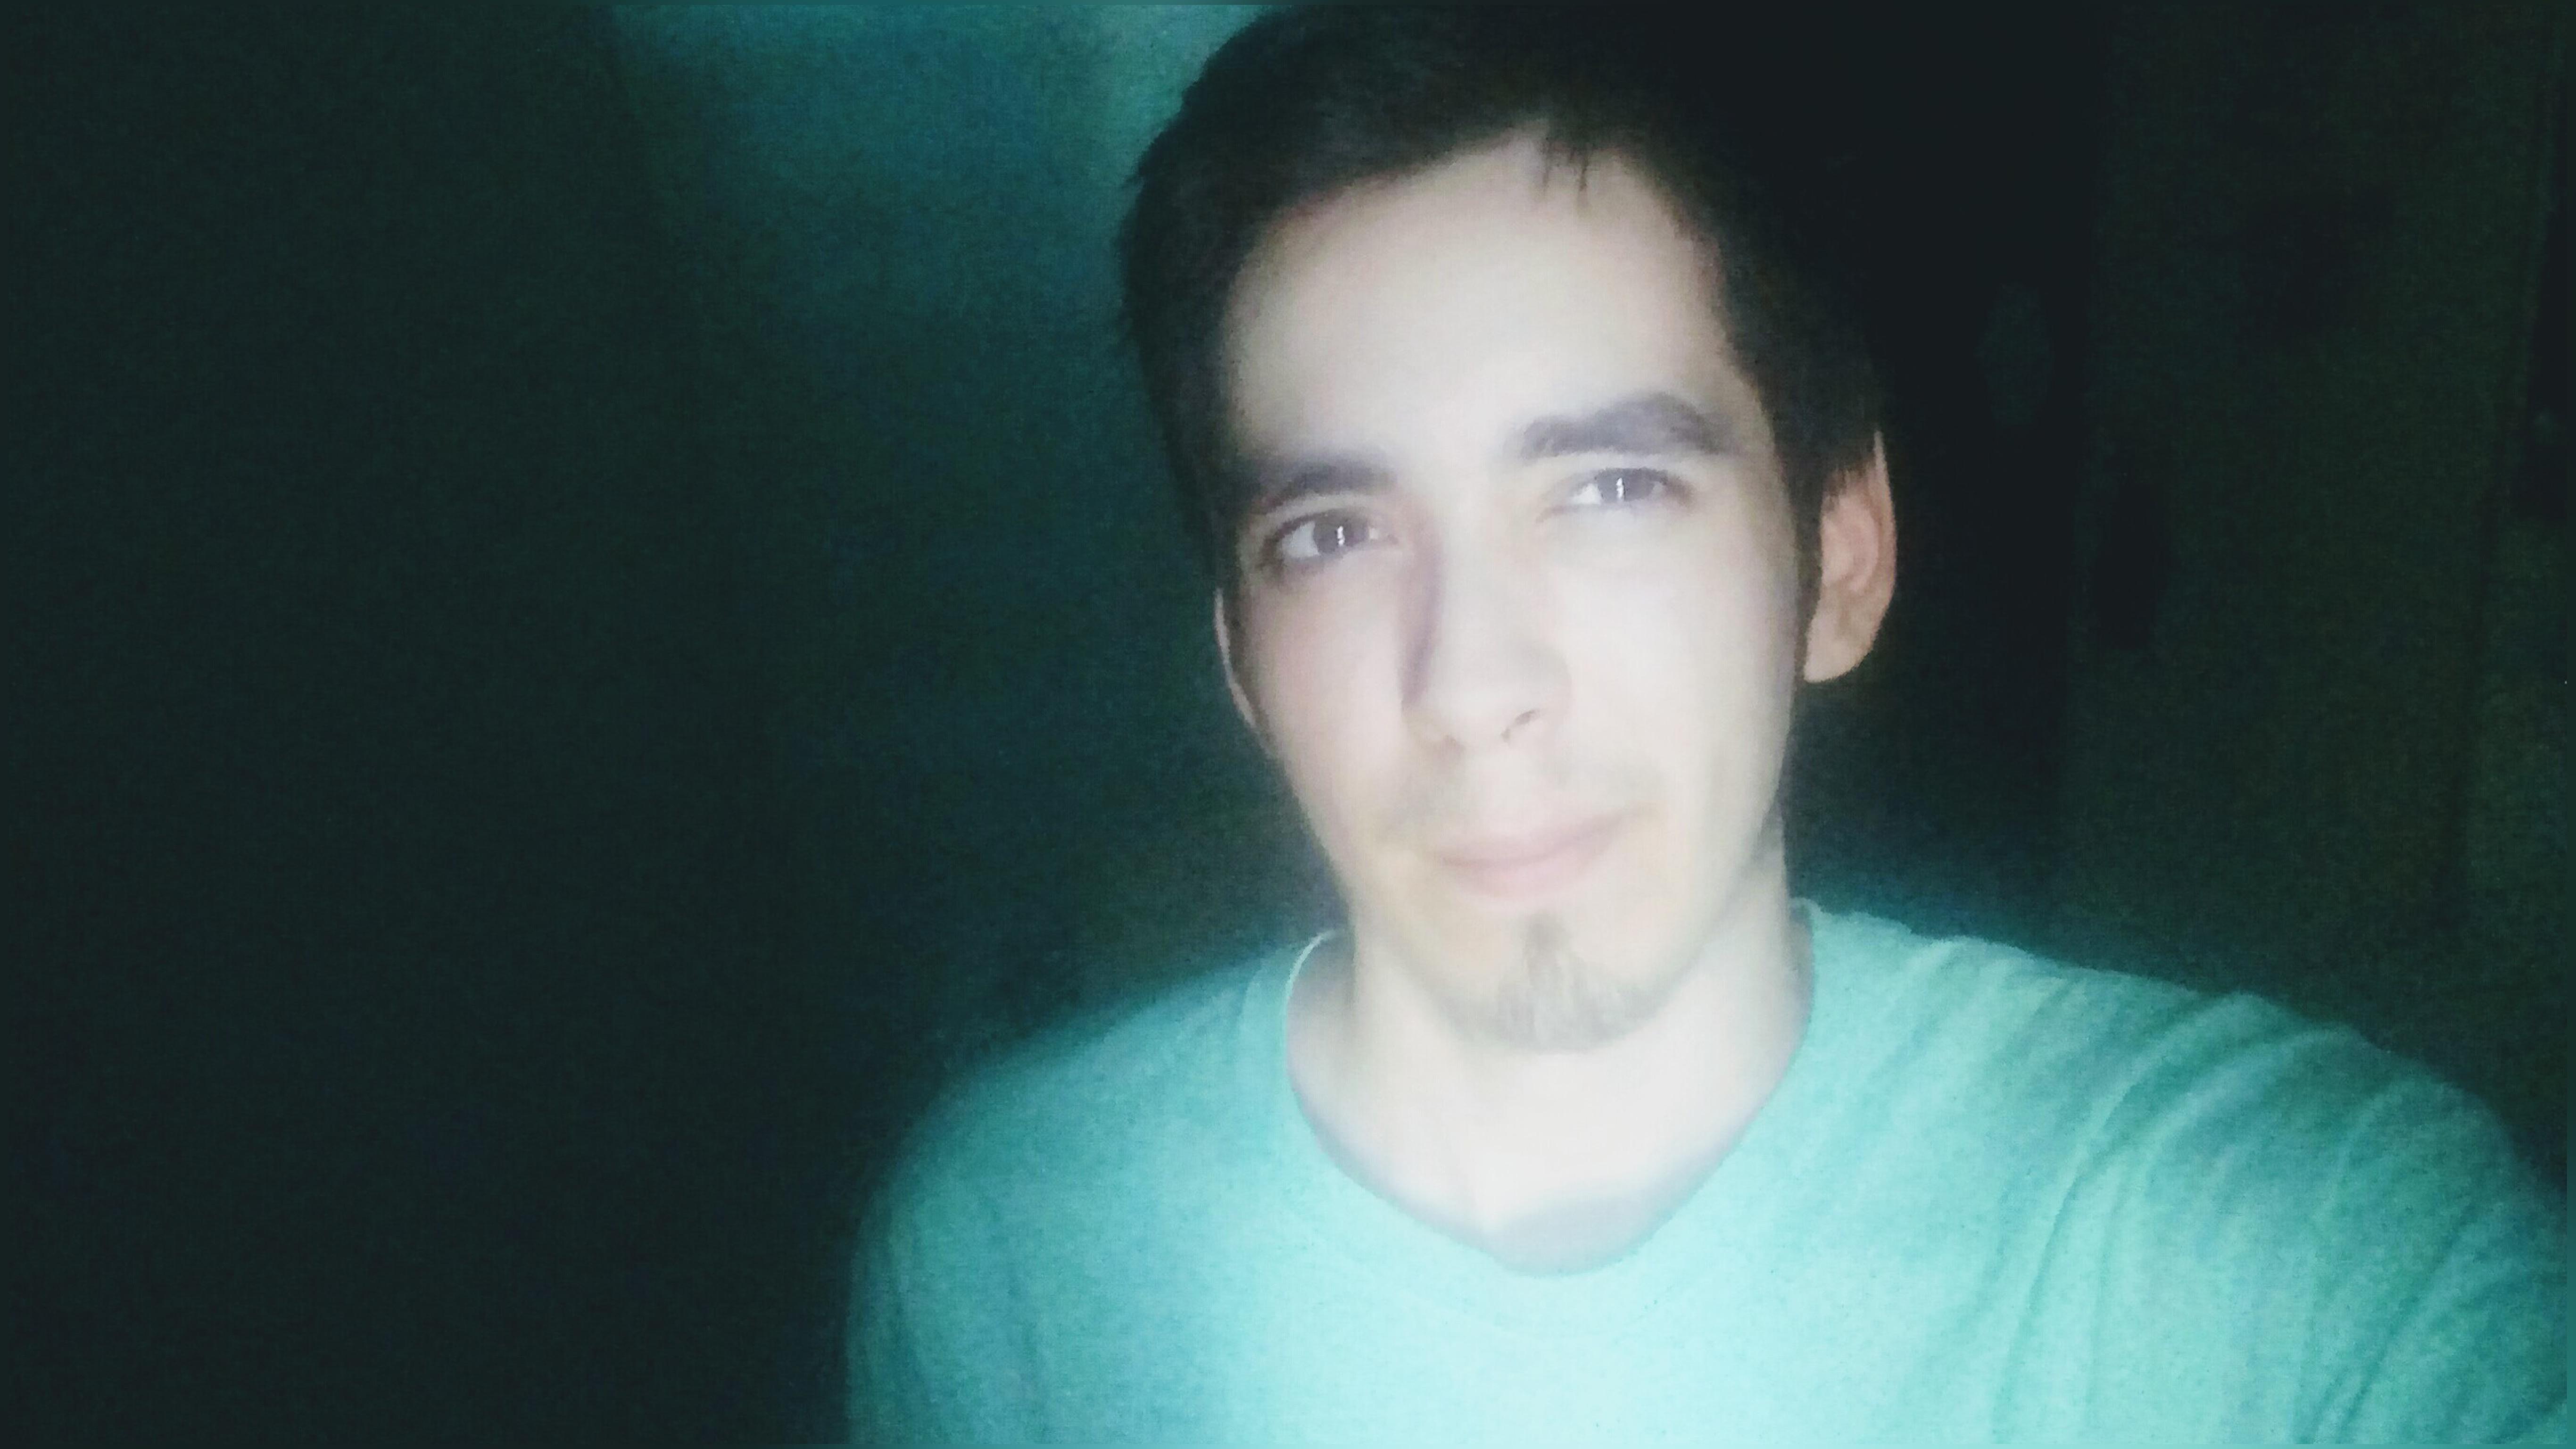 Jesus-Garcia-Arellano-creador-videojuego-Never-Be-Alone